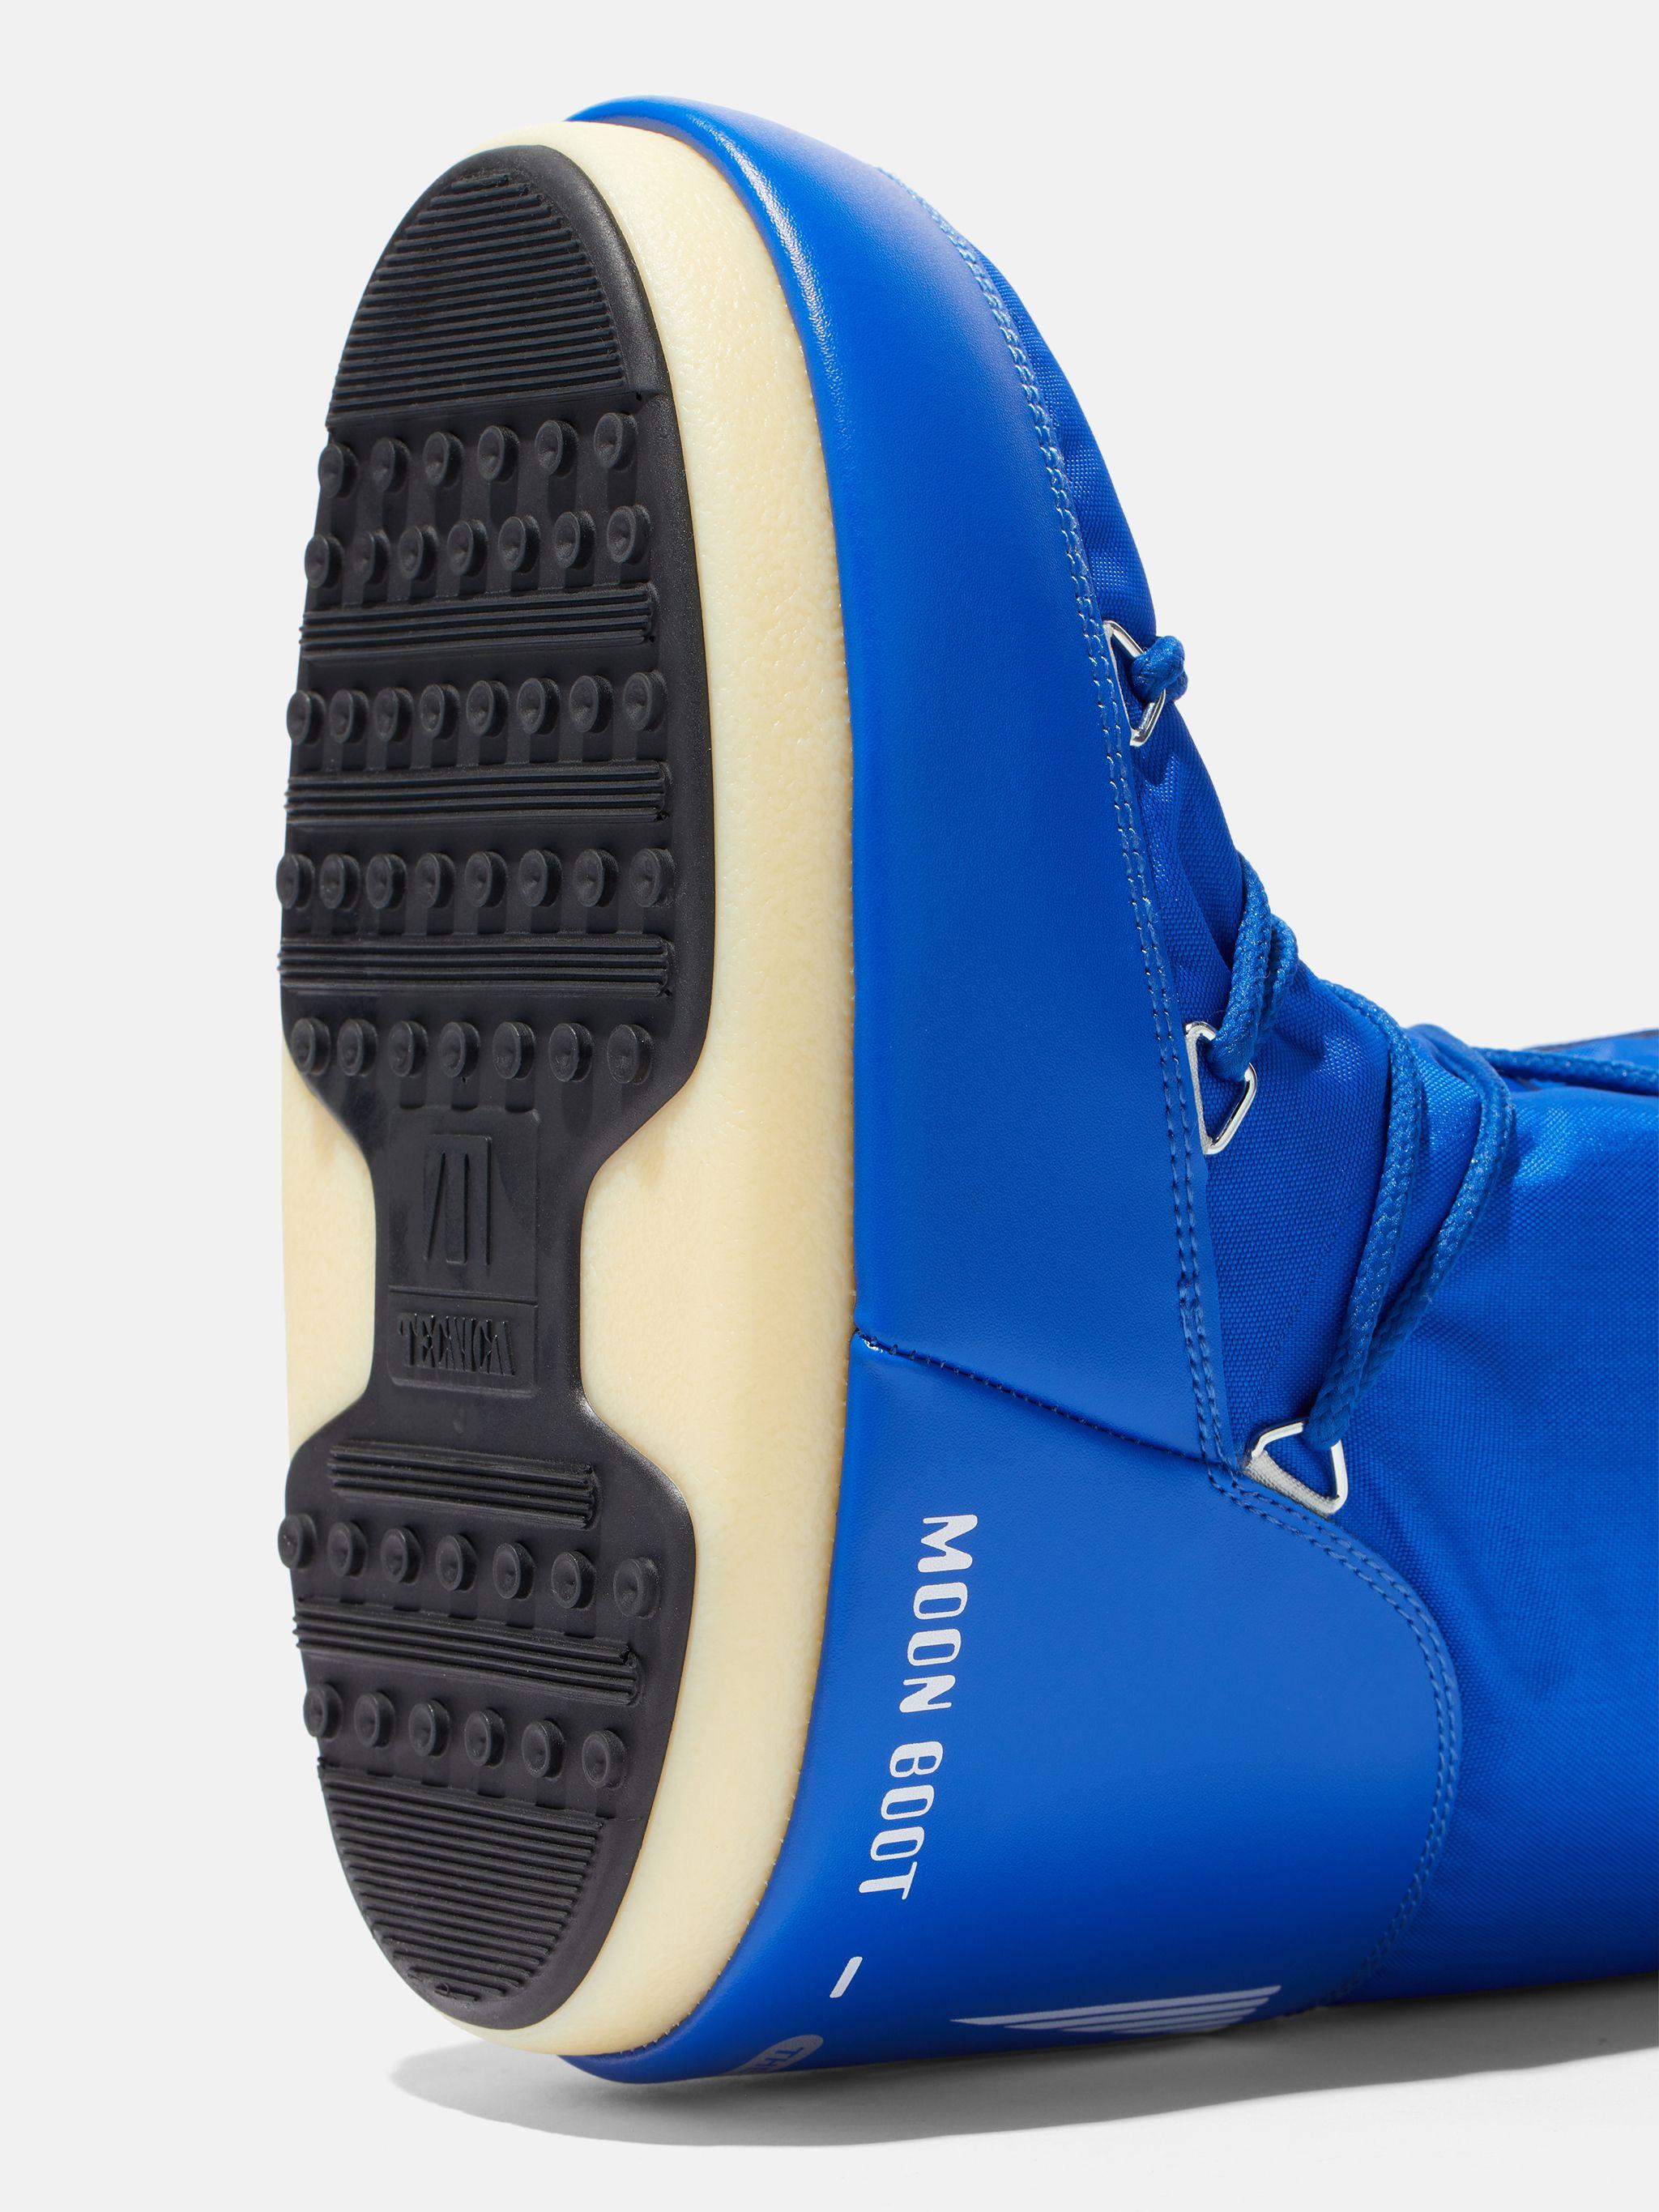 ICON JUNIOR ELECTRIC-BLUE NYLON BOOTS